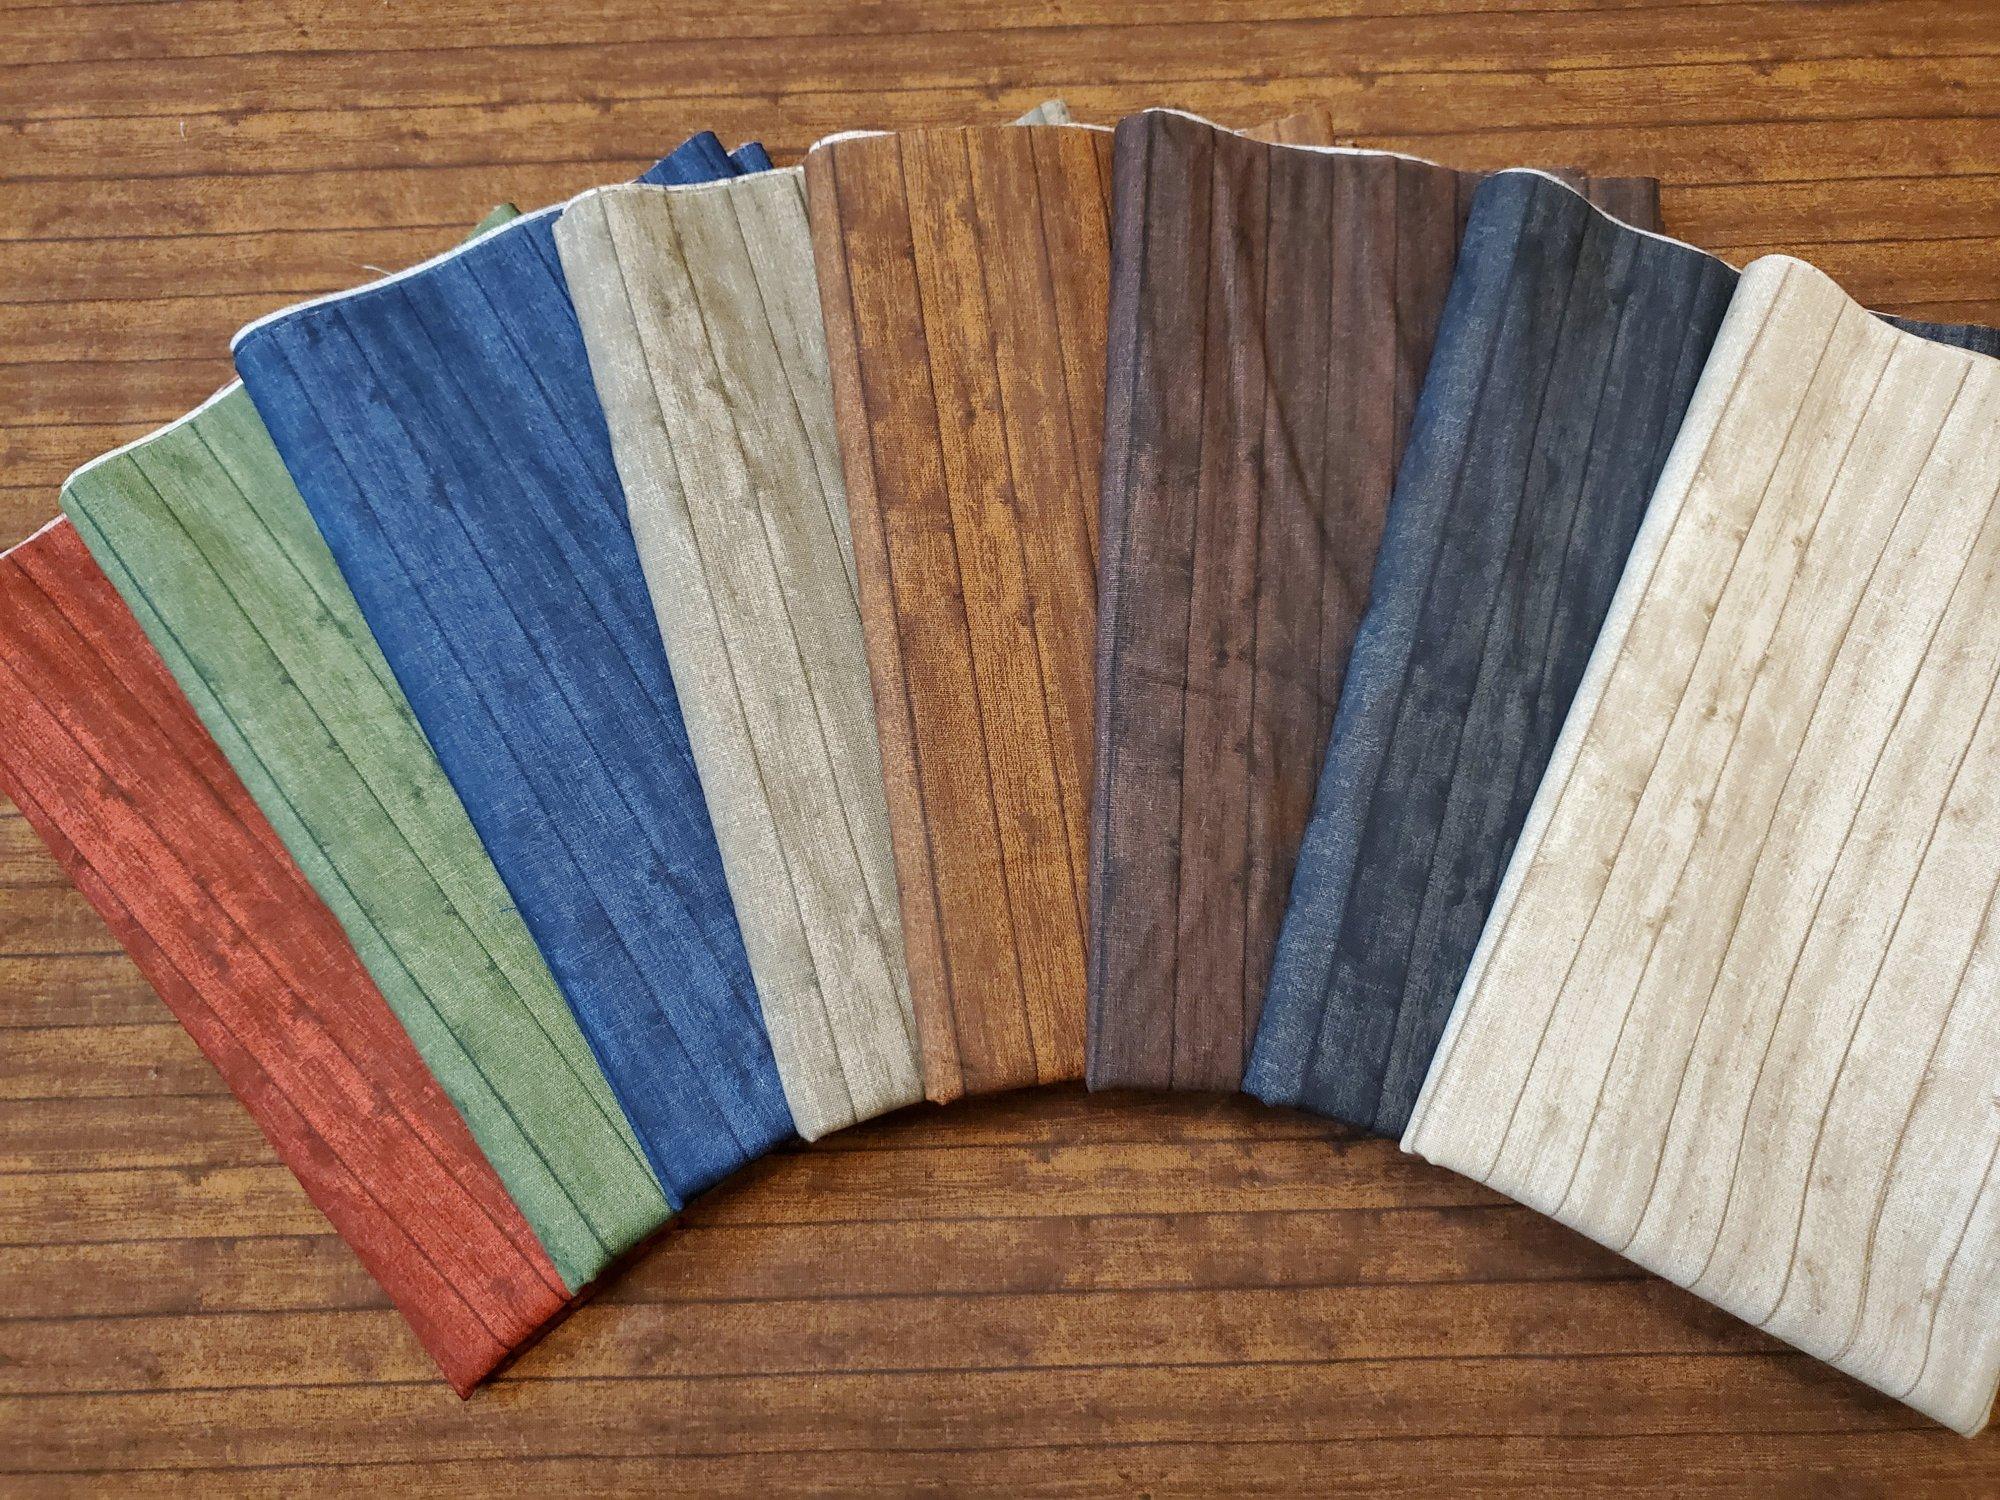 Wood Planks - Rachael's Picks - 8 Piece Half Yard Bundle Pack